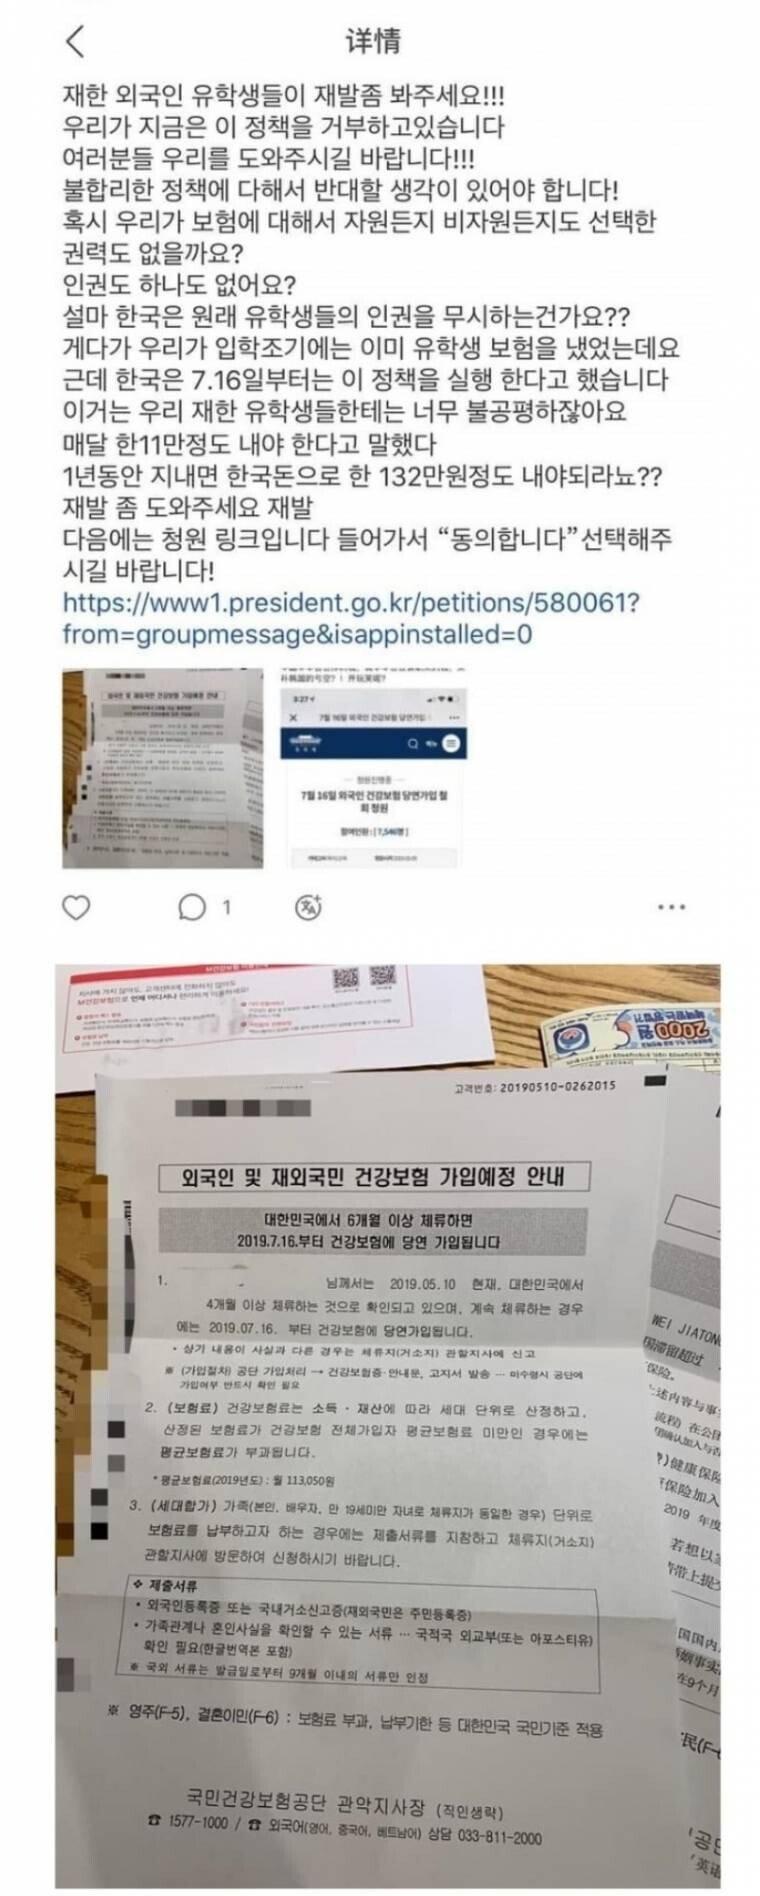 11.jpg 한국 정부에 열받은 흔한 조선족........jpg